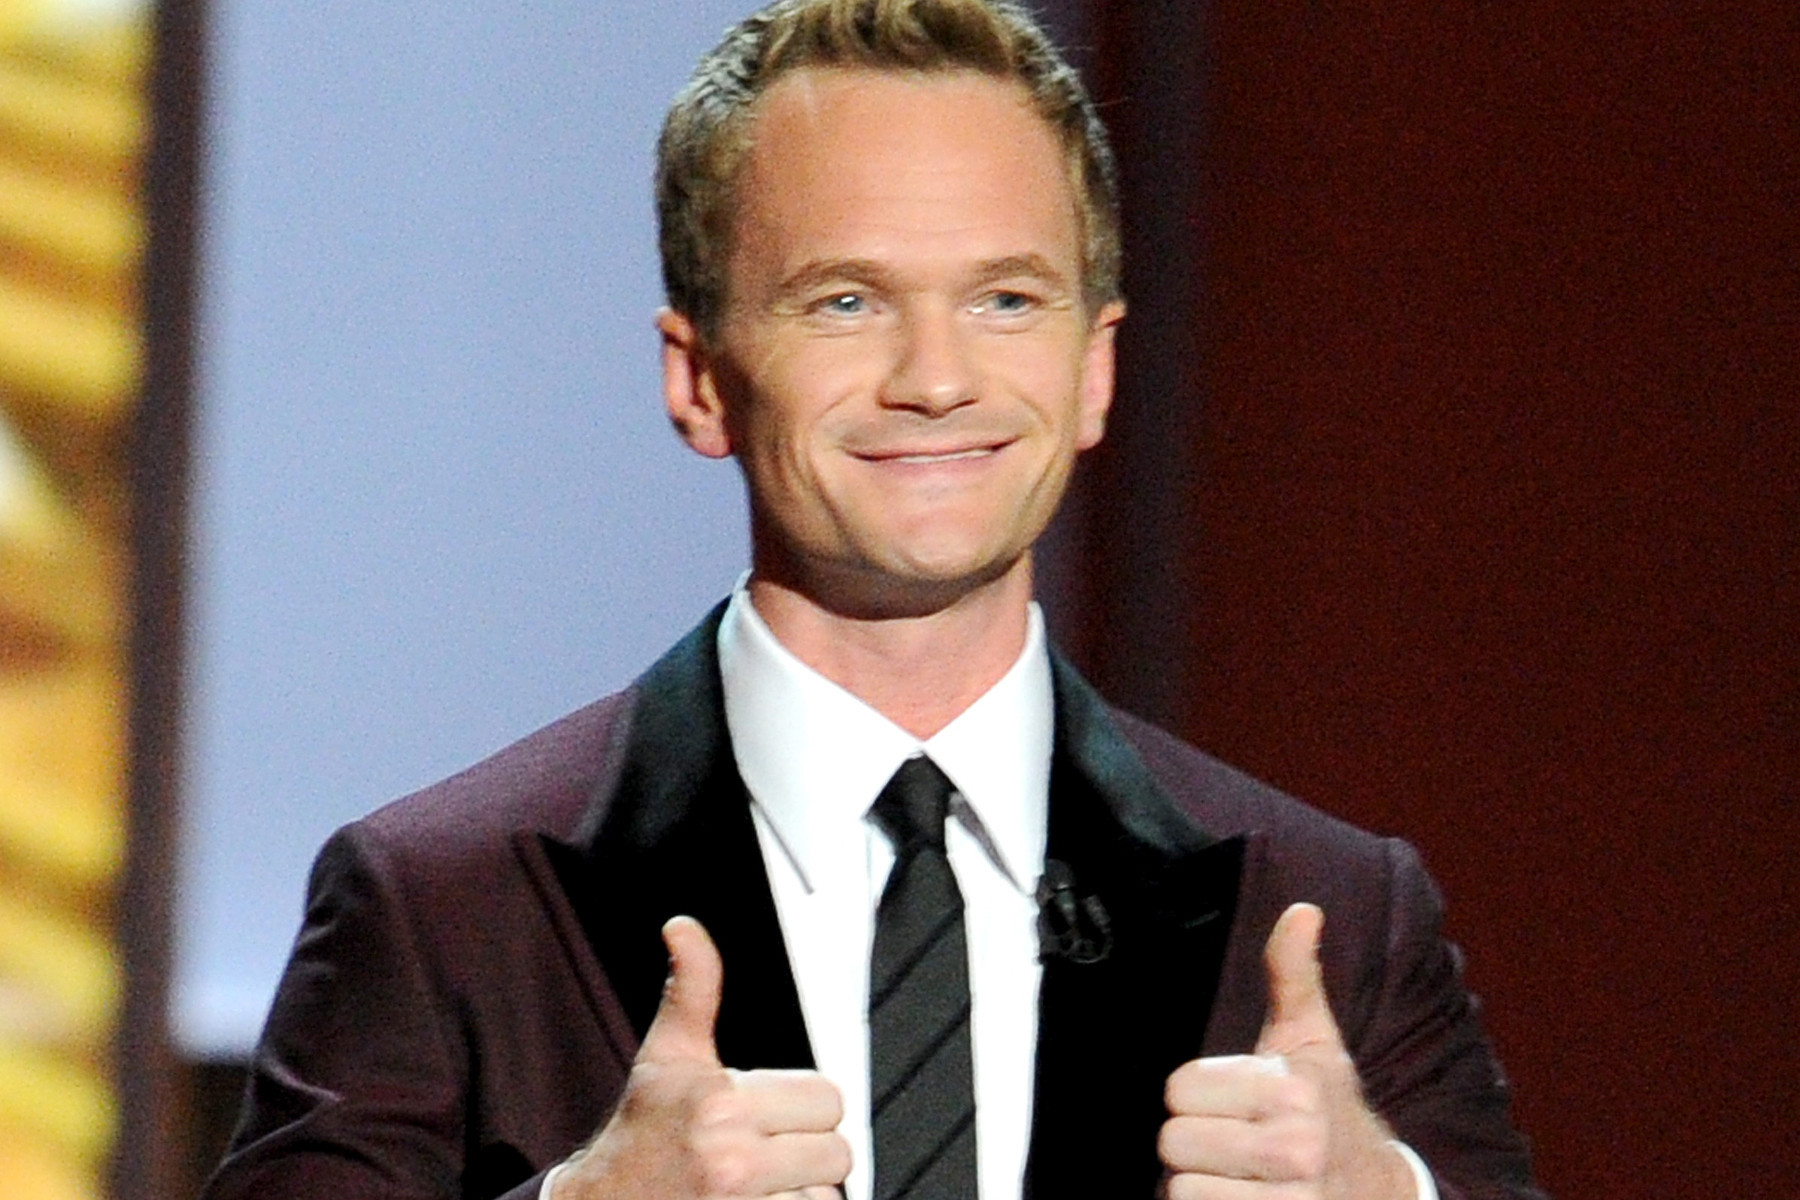 FILE: Neil Patrick Harris To Host 2015 Academy Awards